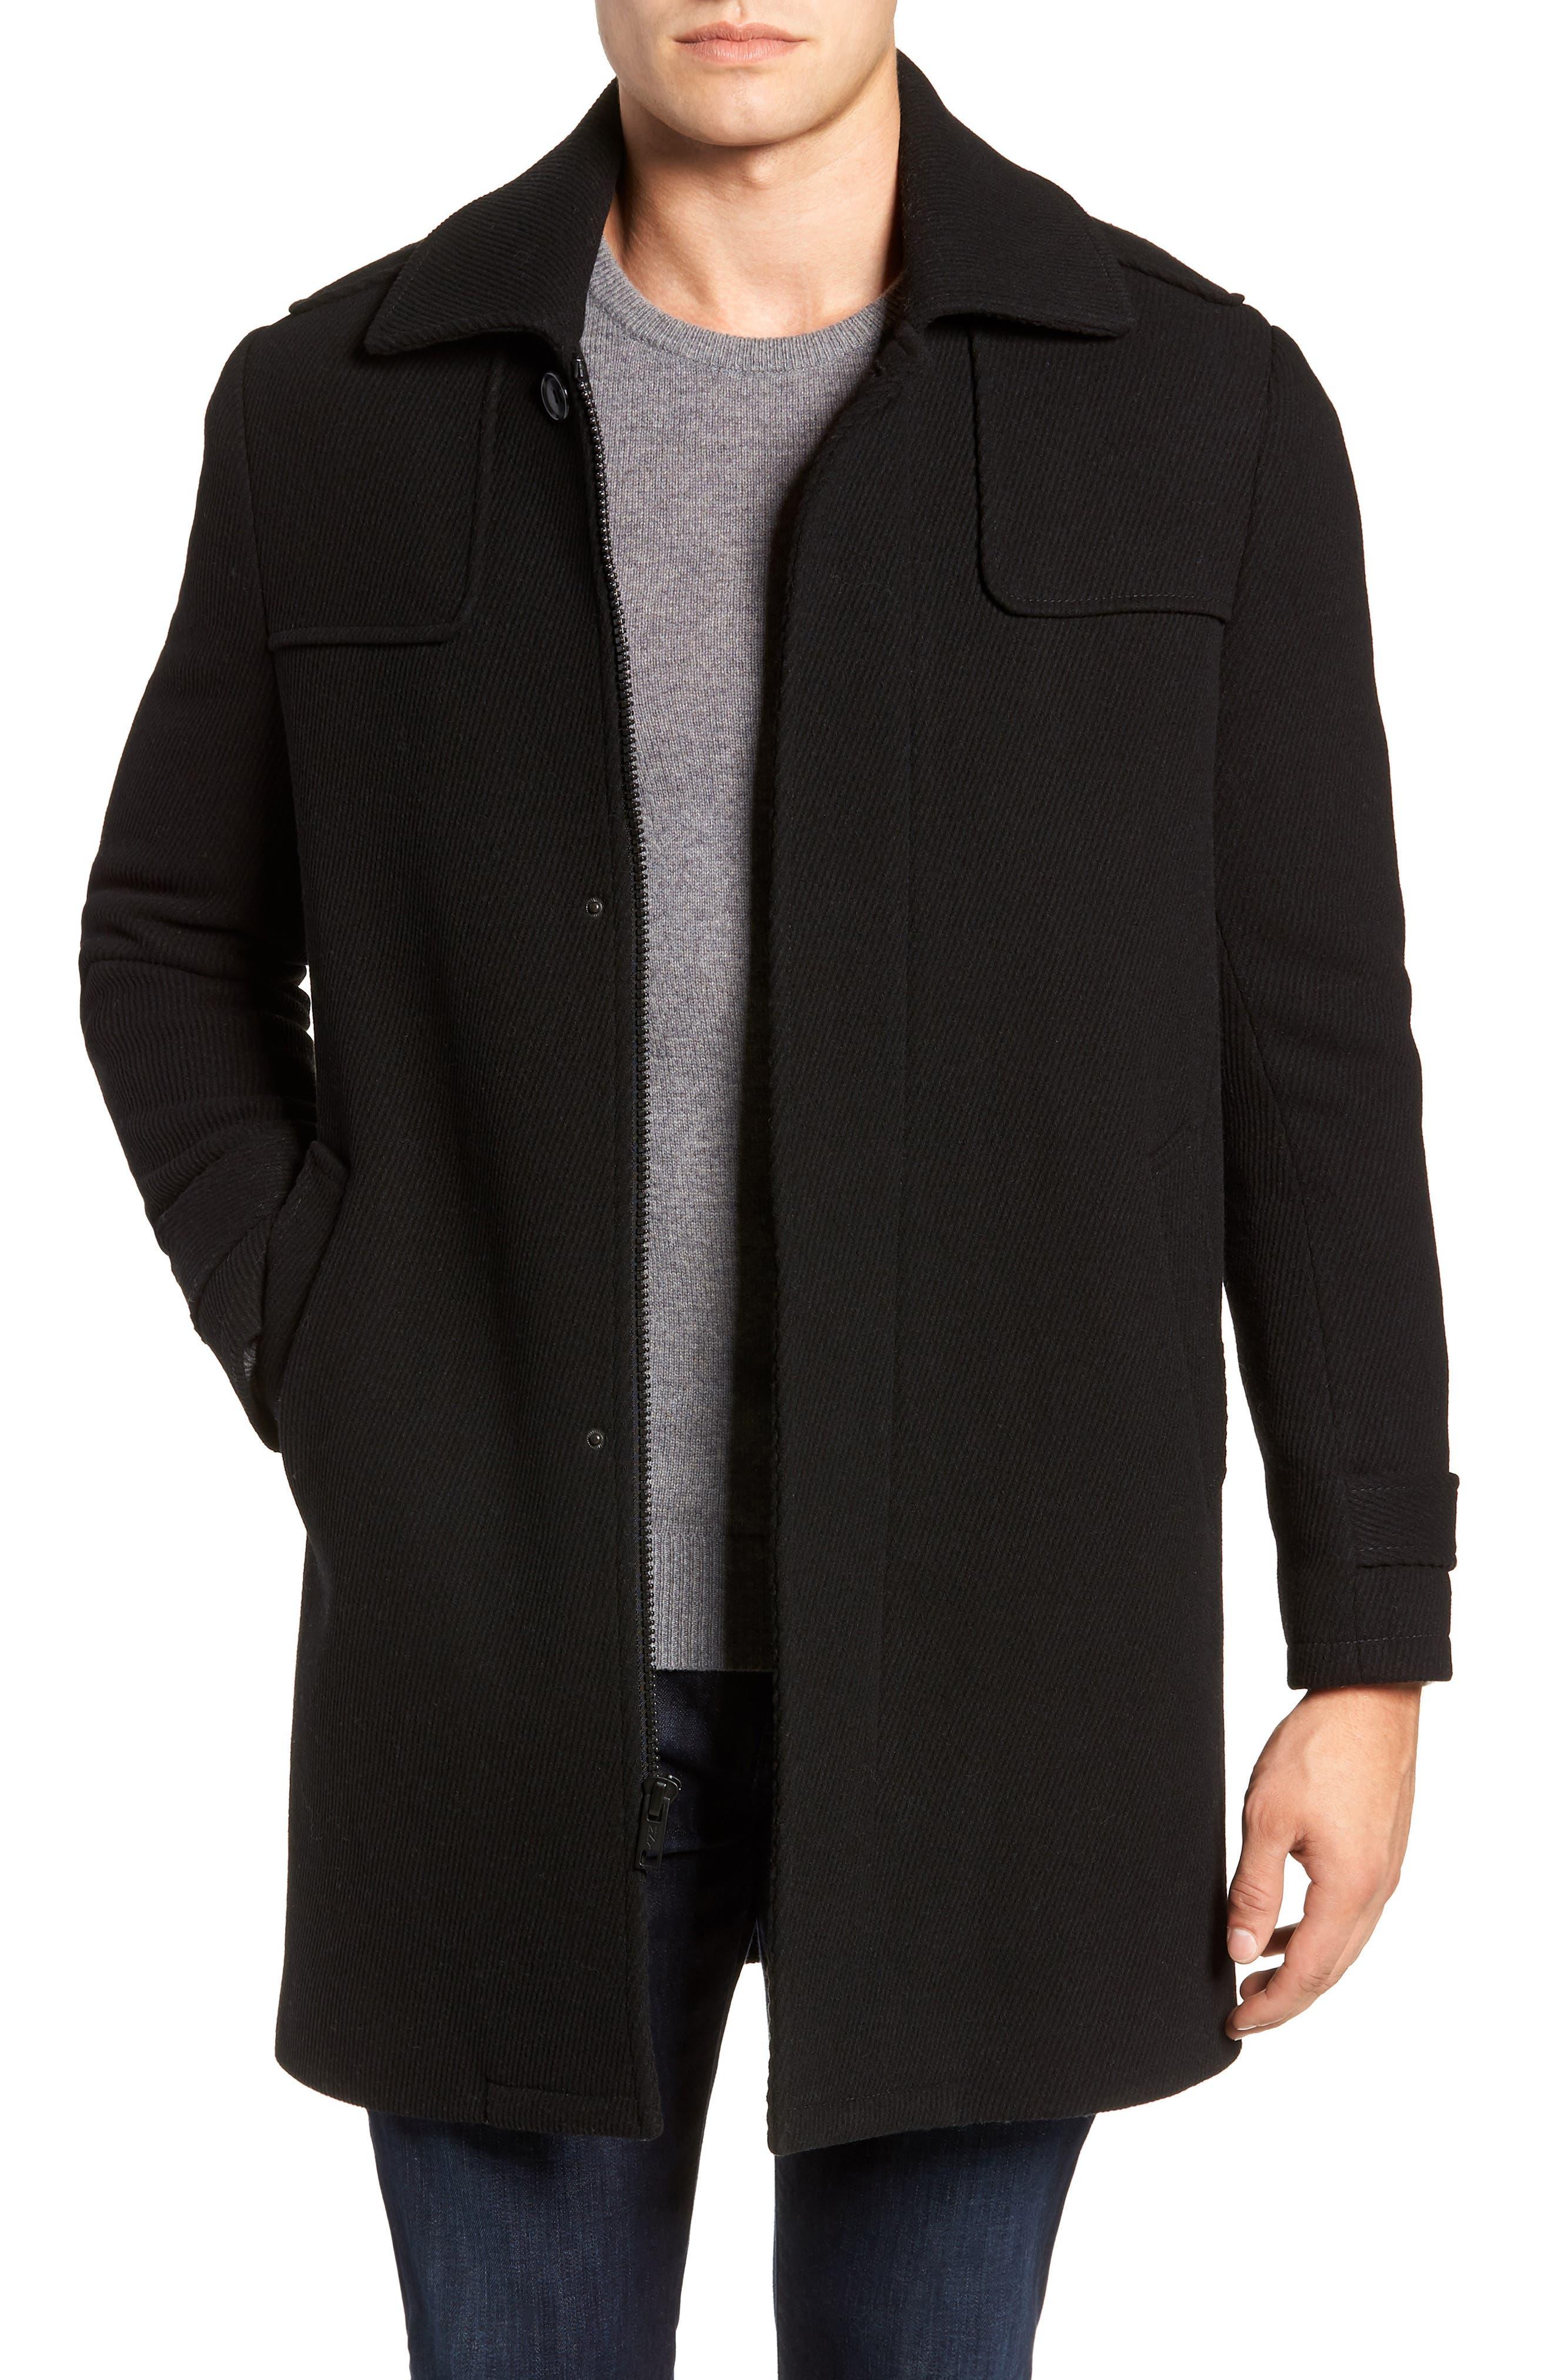 MARC NEW YORK, Edmund Wool Blend Twill Car Coat, Main thumbnail 1, color, BLACK